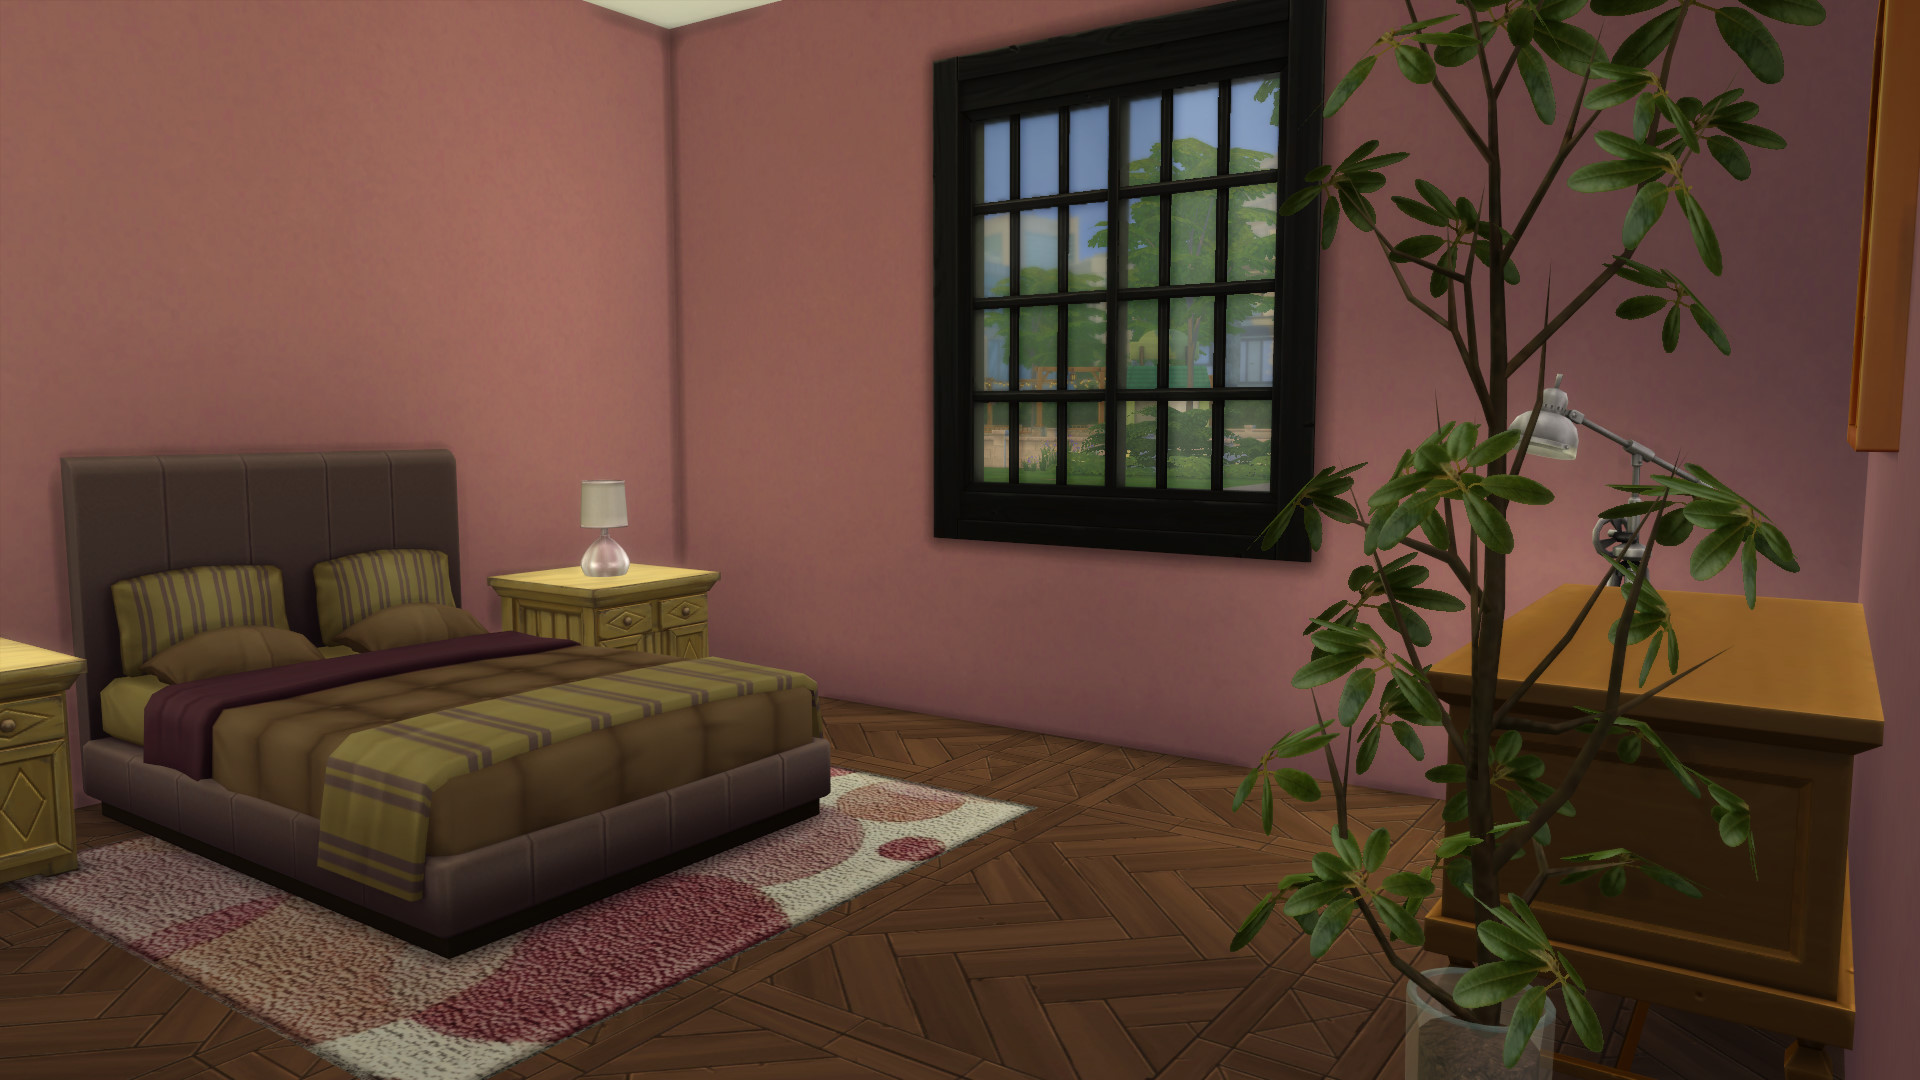 Friends Apartment Sims 5